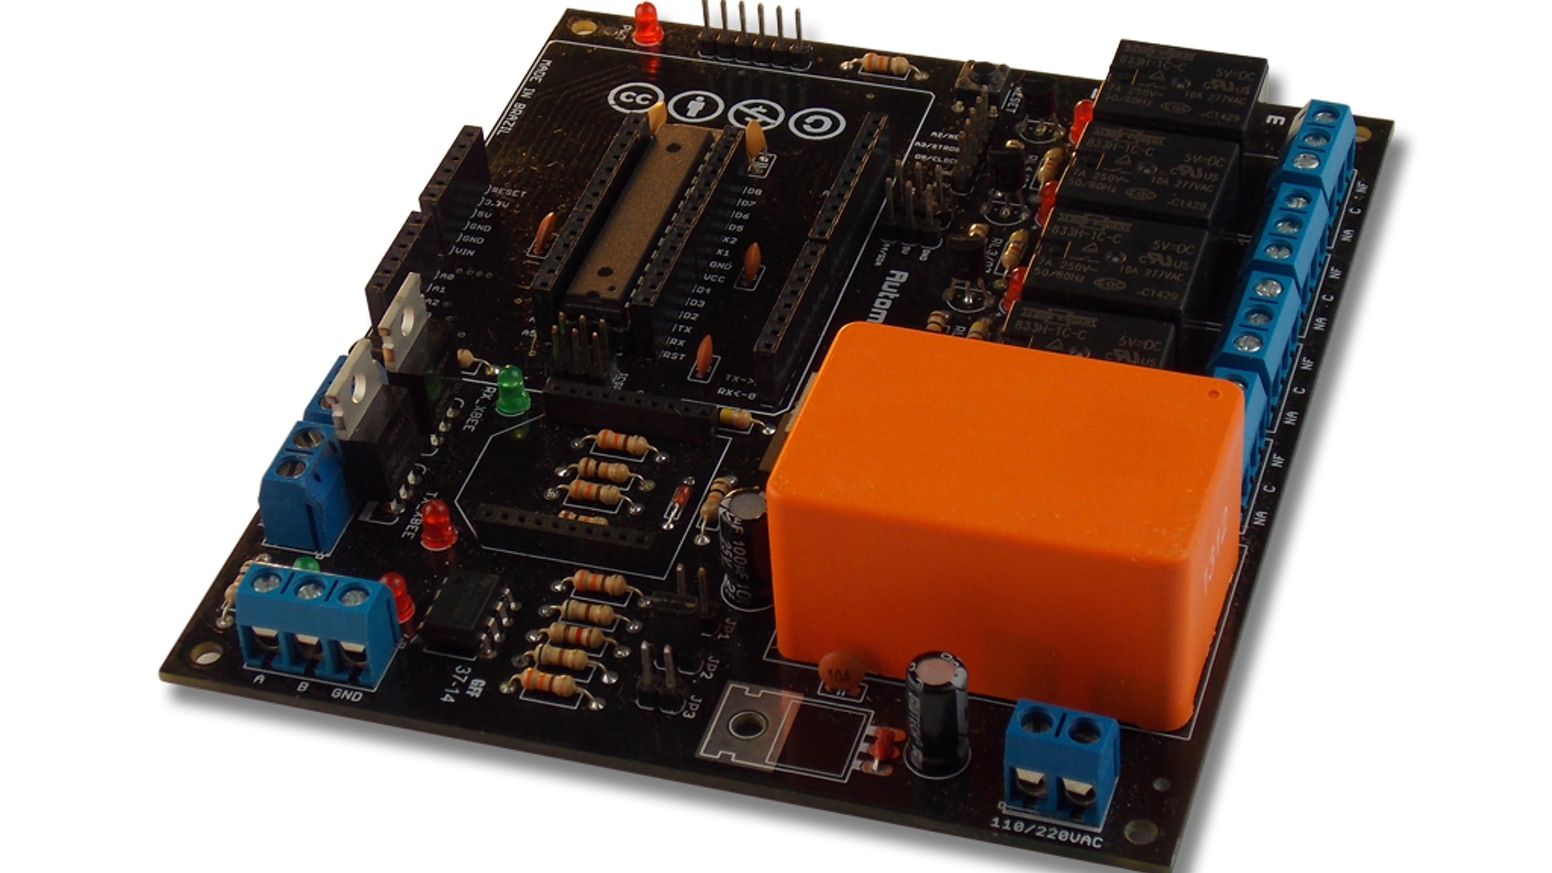 Seeed Studio Kickstarter The Scart Printed Circuit Board Design Is Copyright C Of Retro Gaming 2e18a49615273897800d33b35bcd8b79 Originalixlibrb 11 Automation